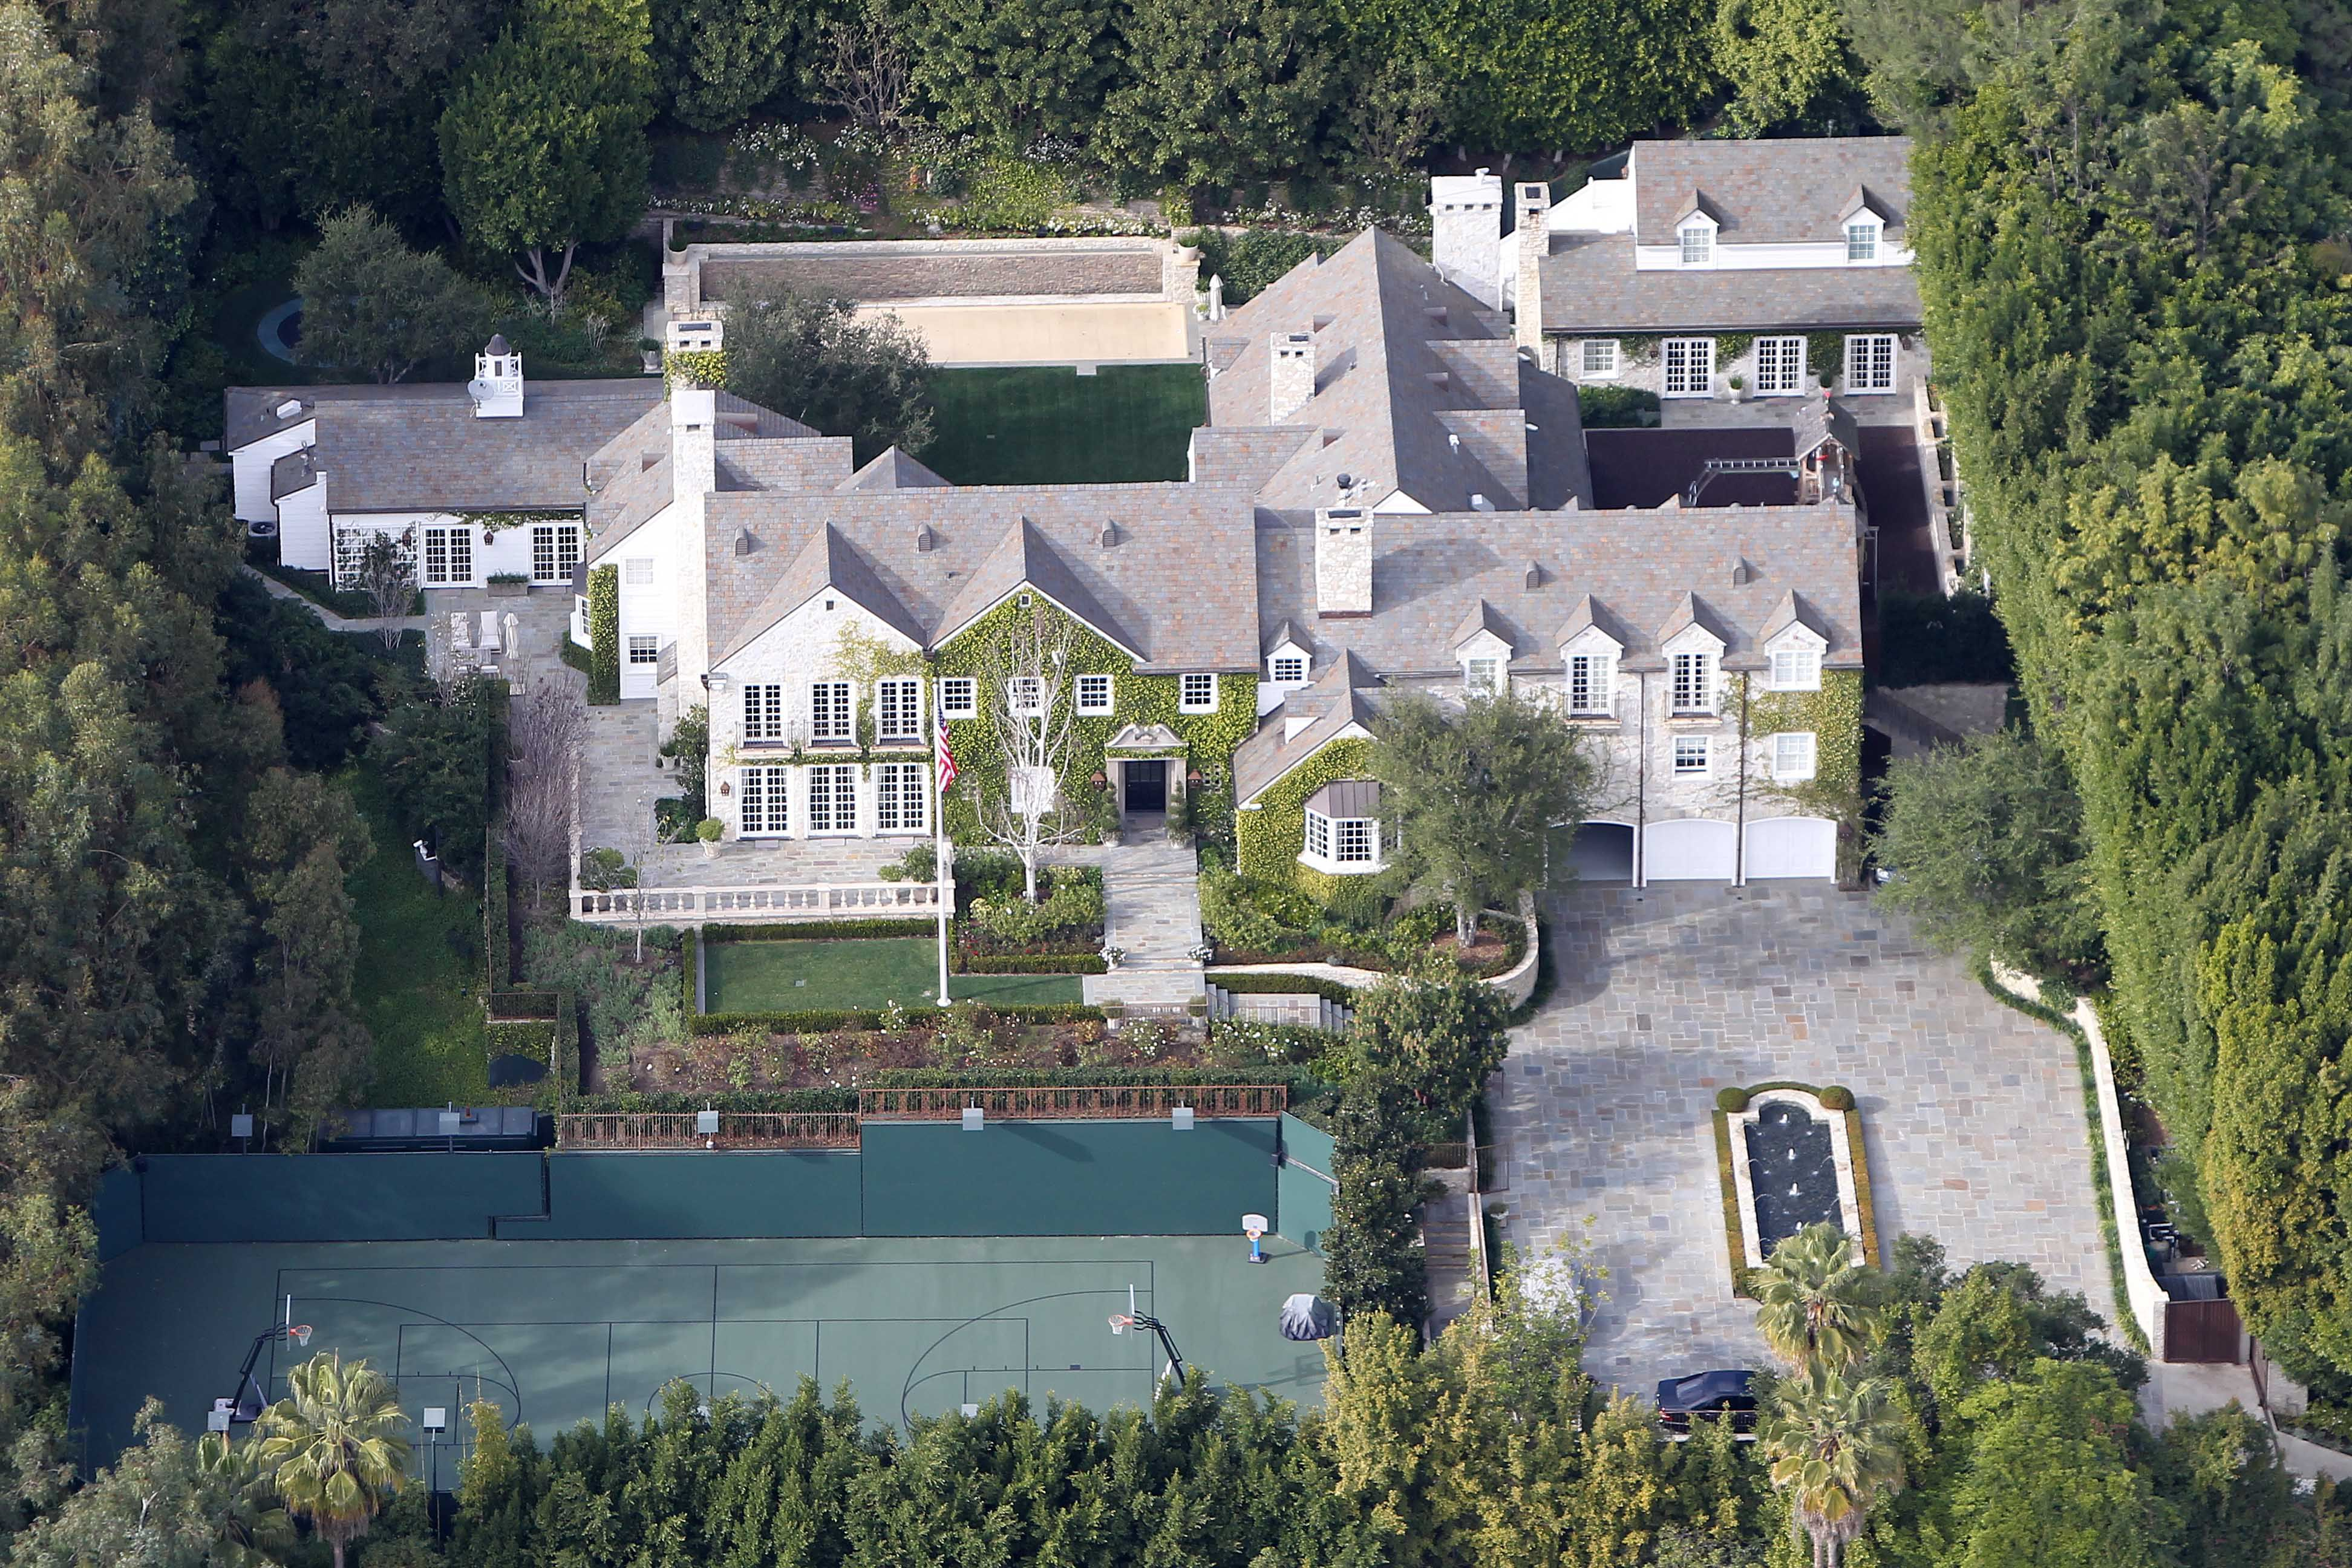 839 mansion photo